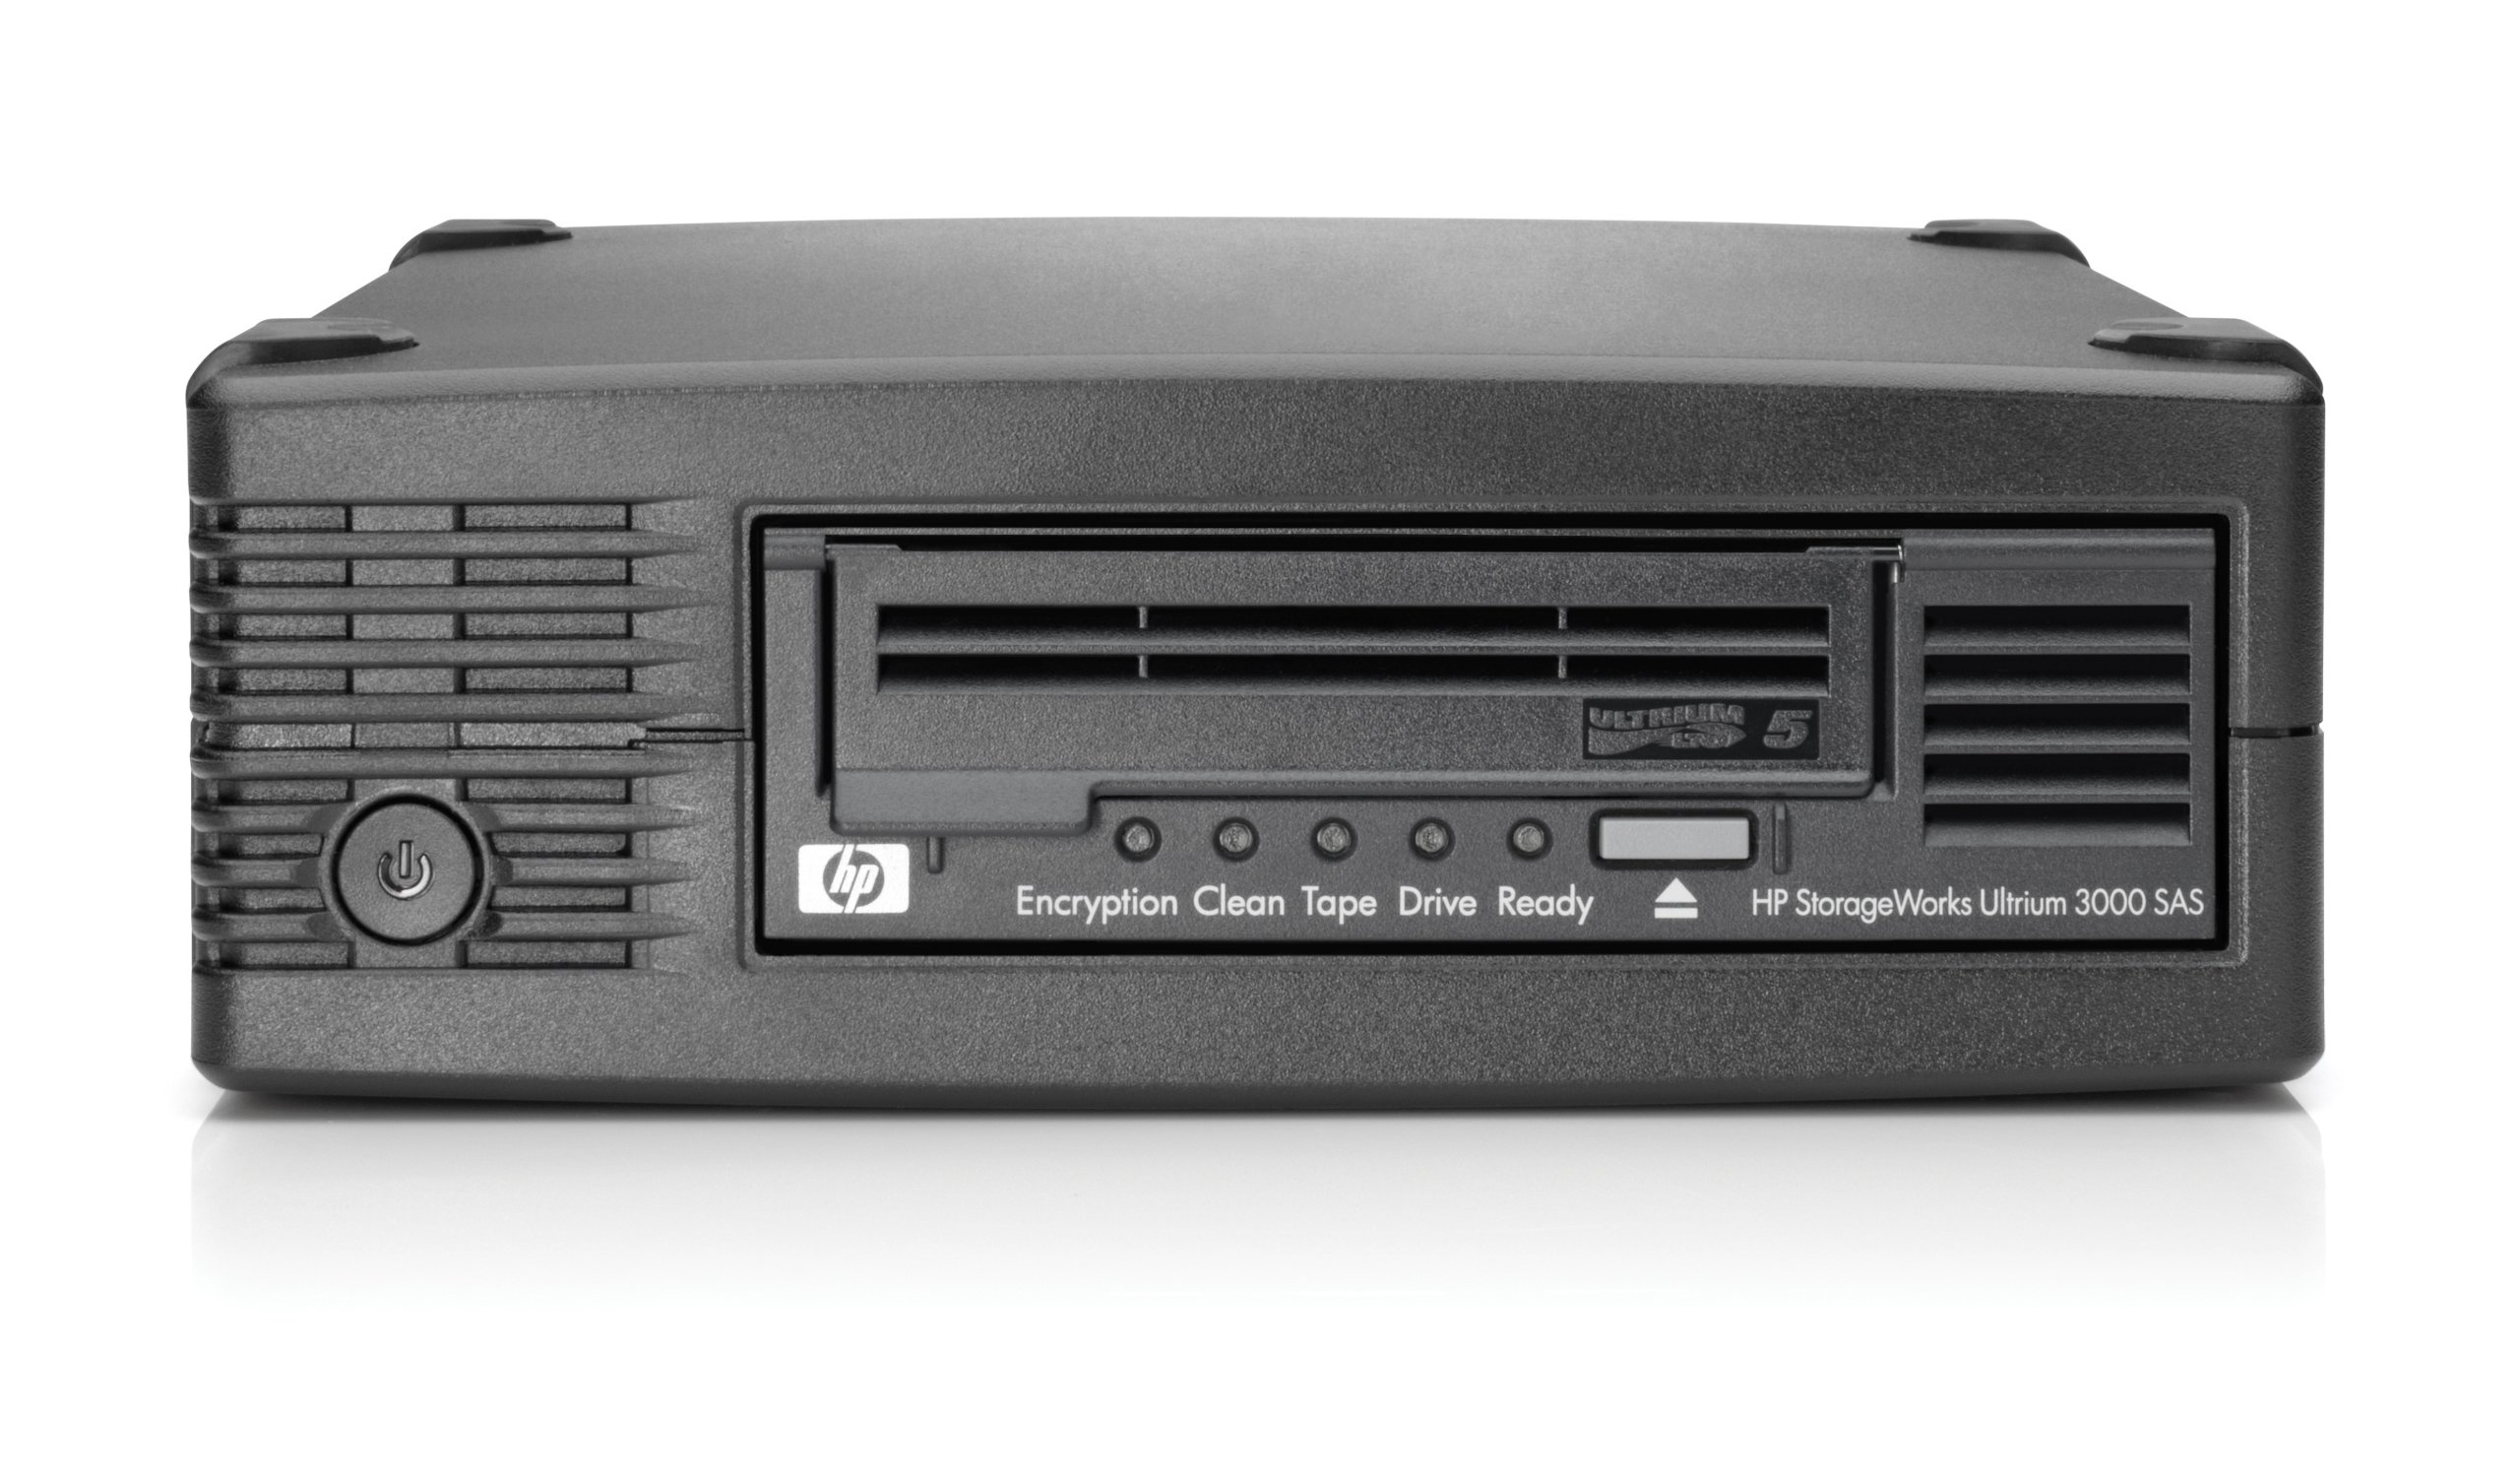 HP LTO5 Ult 3000 Sas Ext Tpe Drive/s-buy-hp LTO5 Ult 3000 Sas Ext Tpe Drive/s-bu